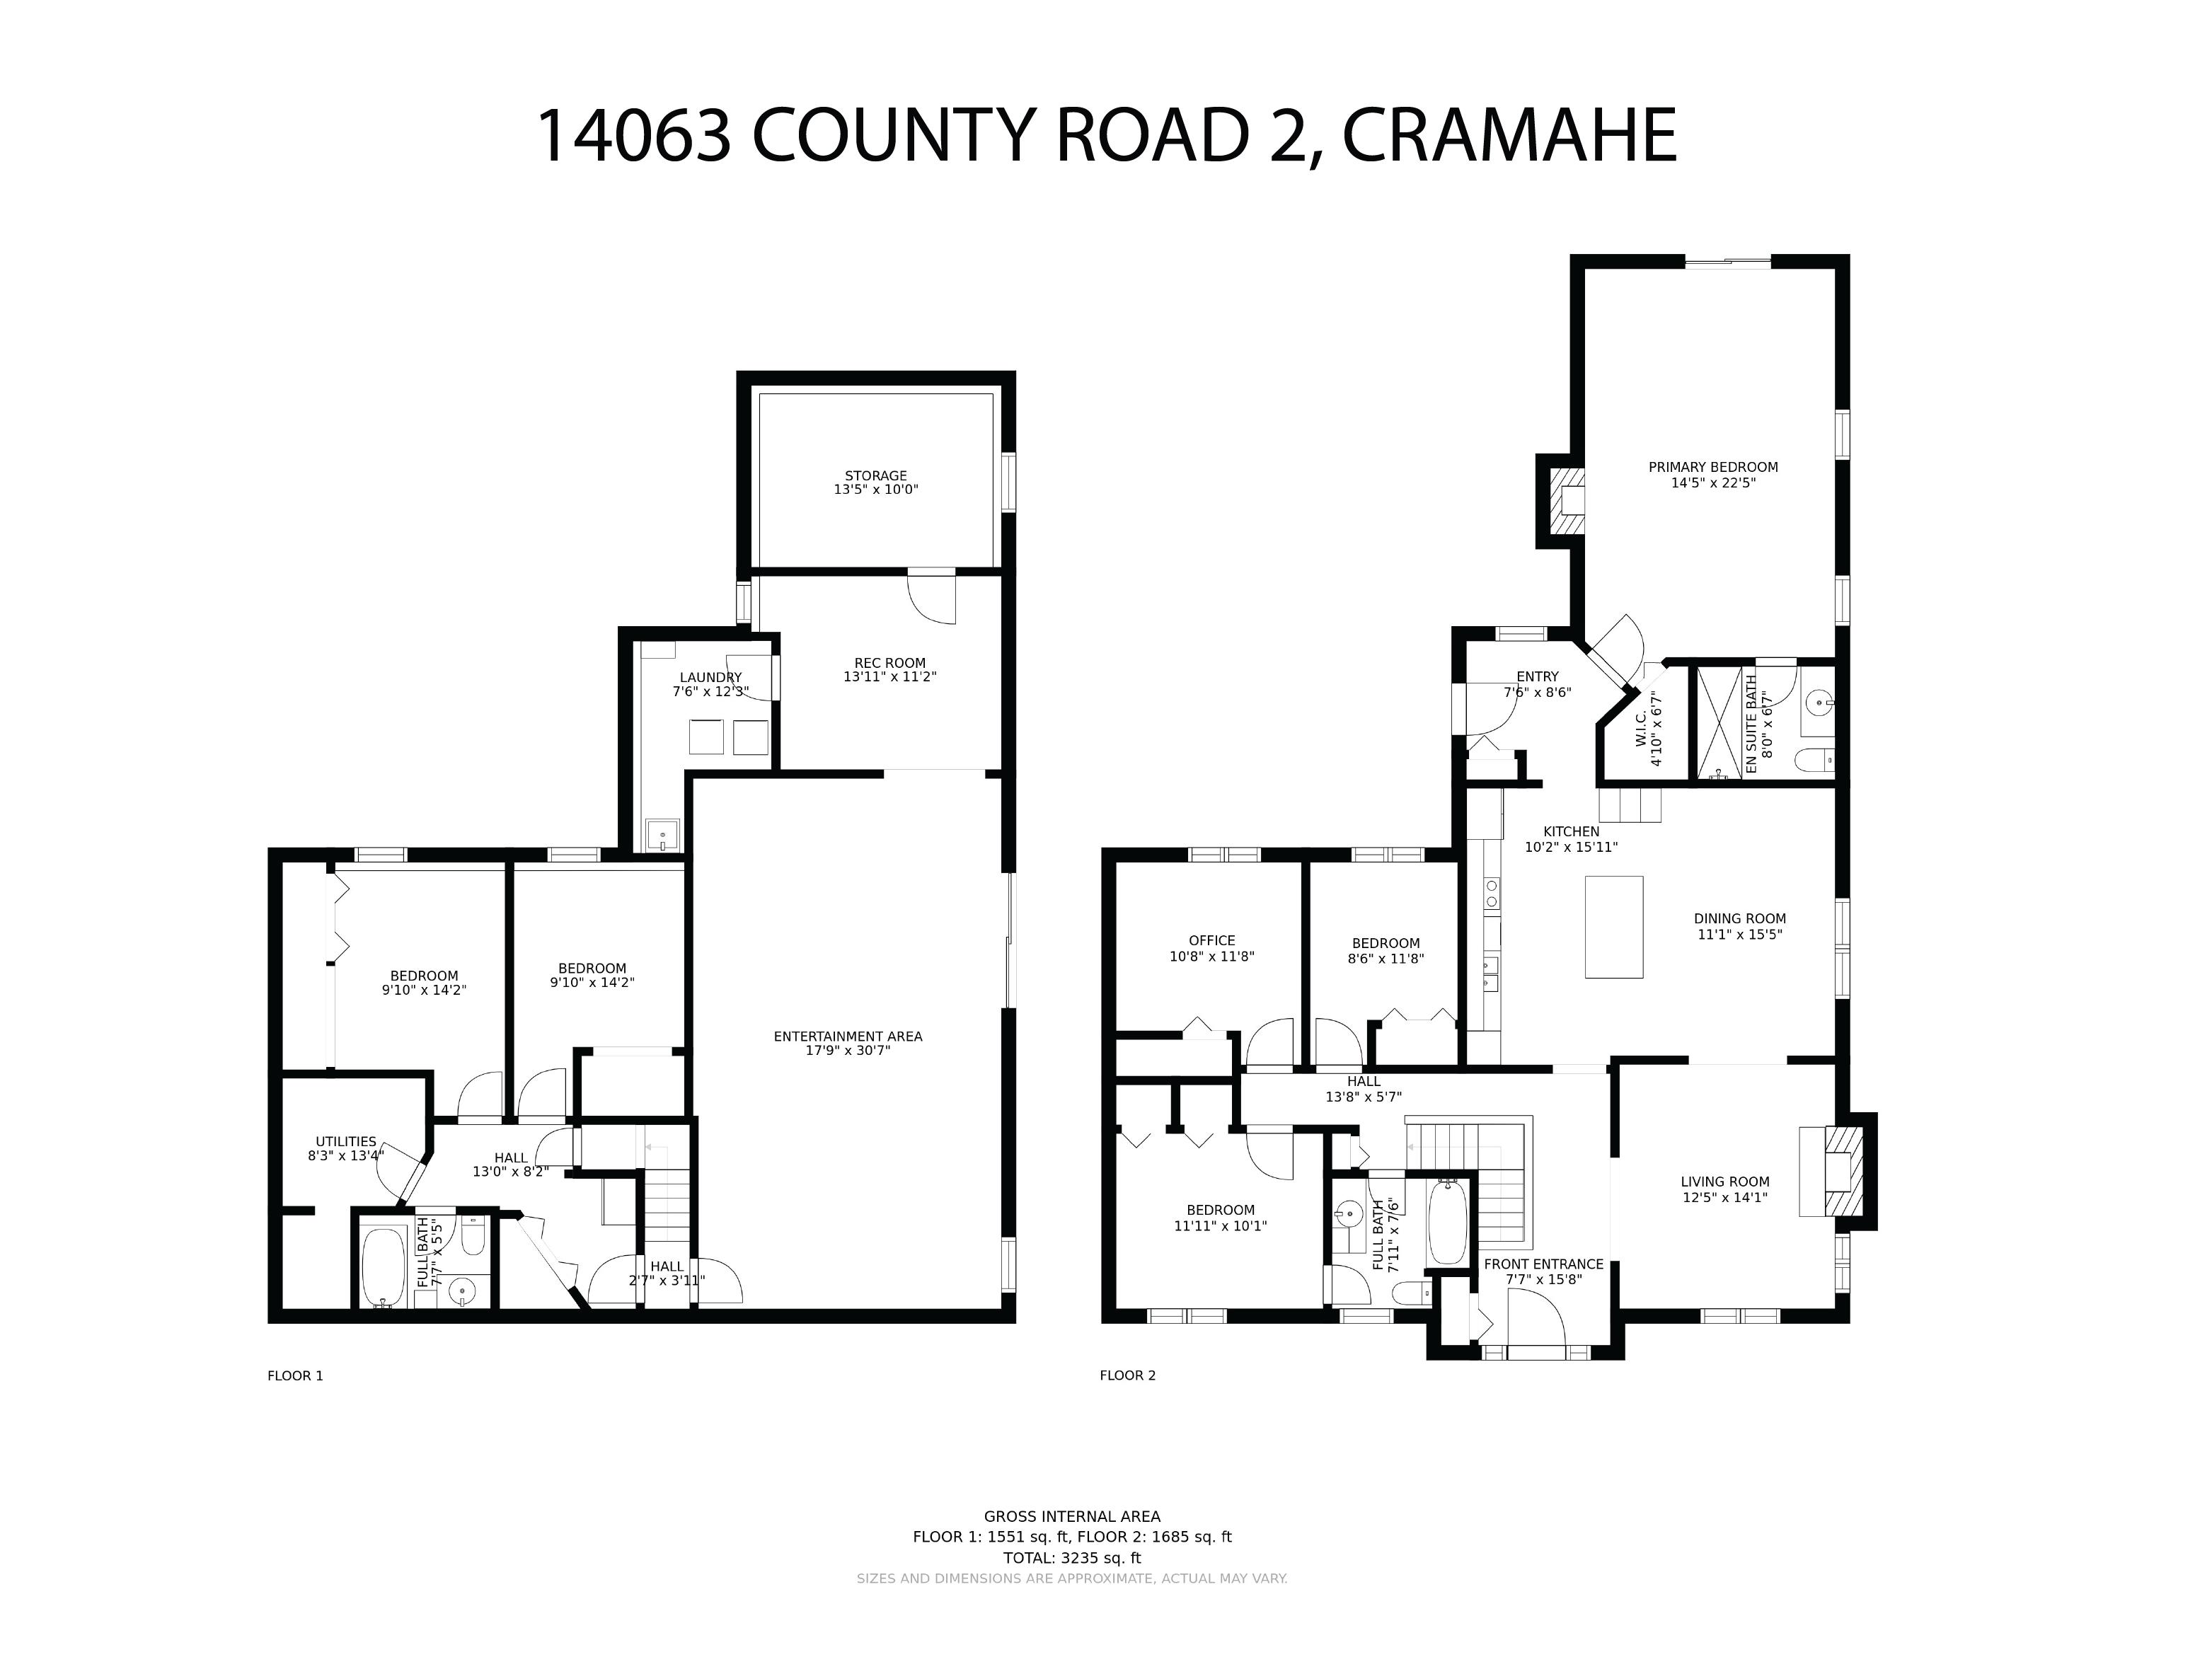 14063 County Rd 2 floorplan